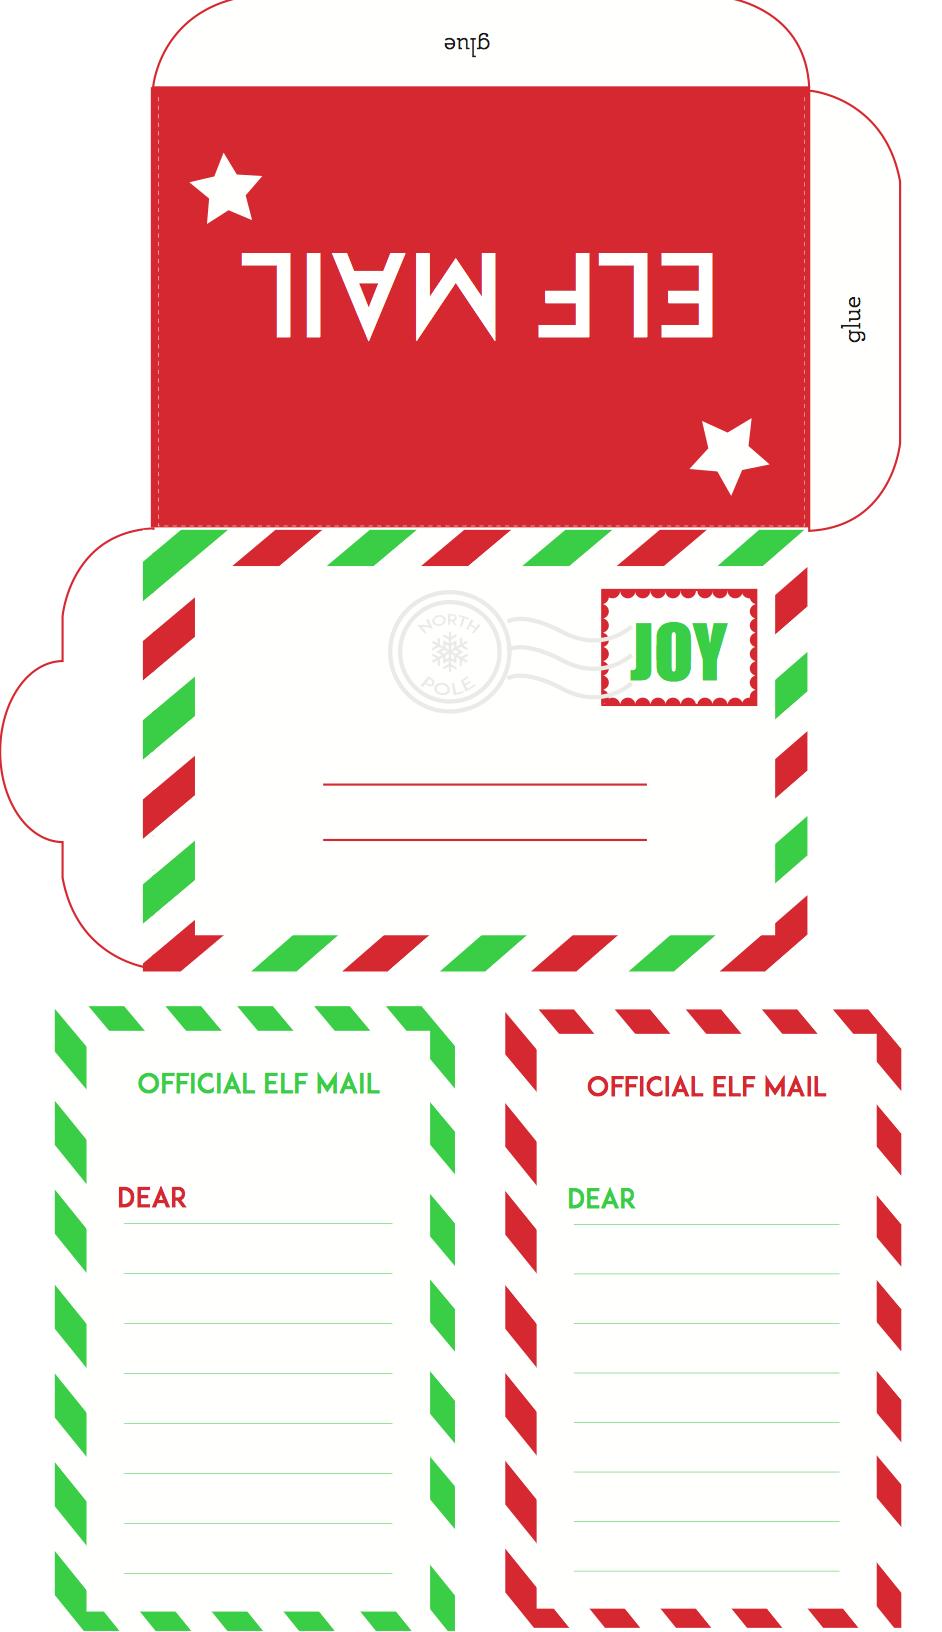 Pimp Your Elf On The Shelf – Free Printables | Take It From Mummy - Elf On The Shelf Printable Props Free